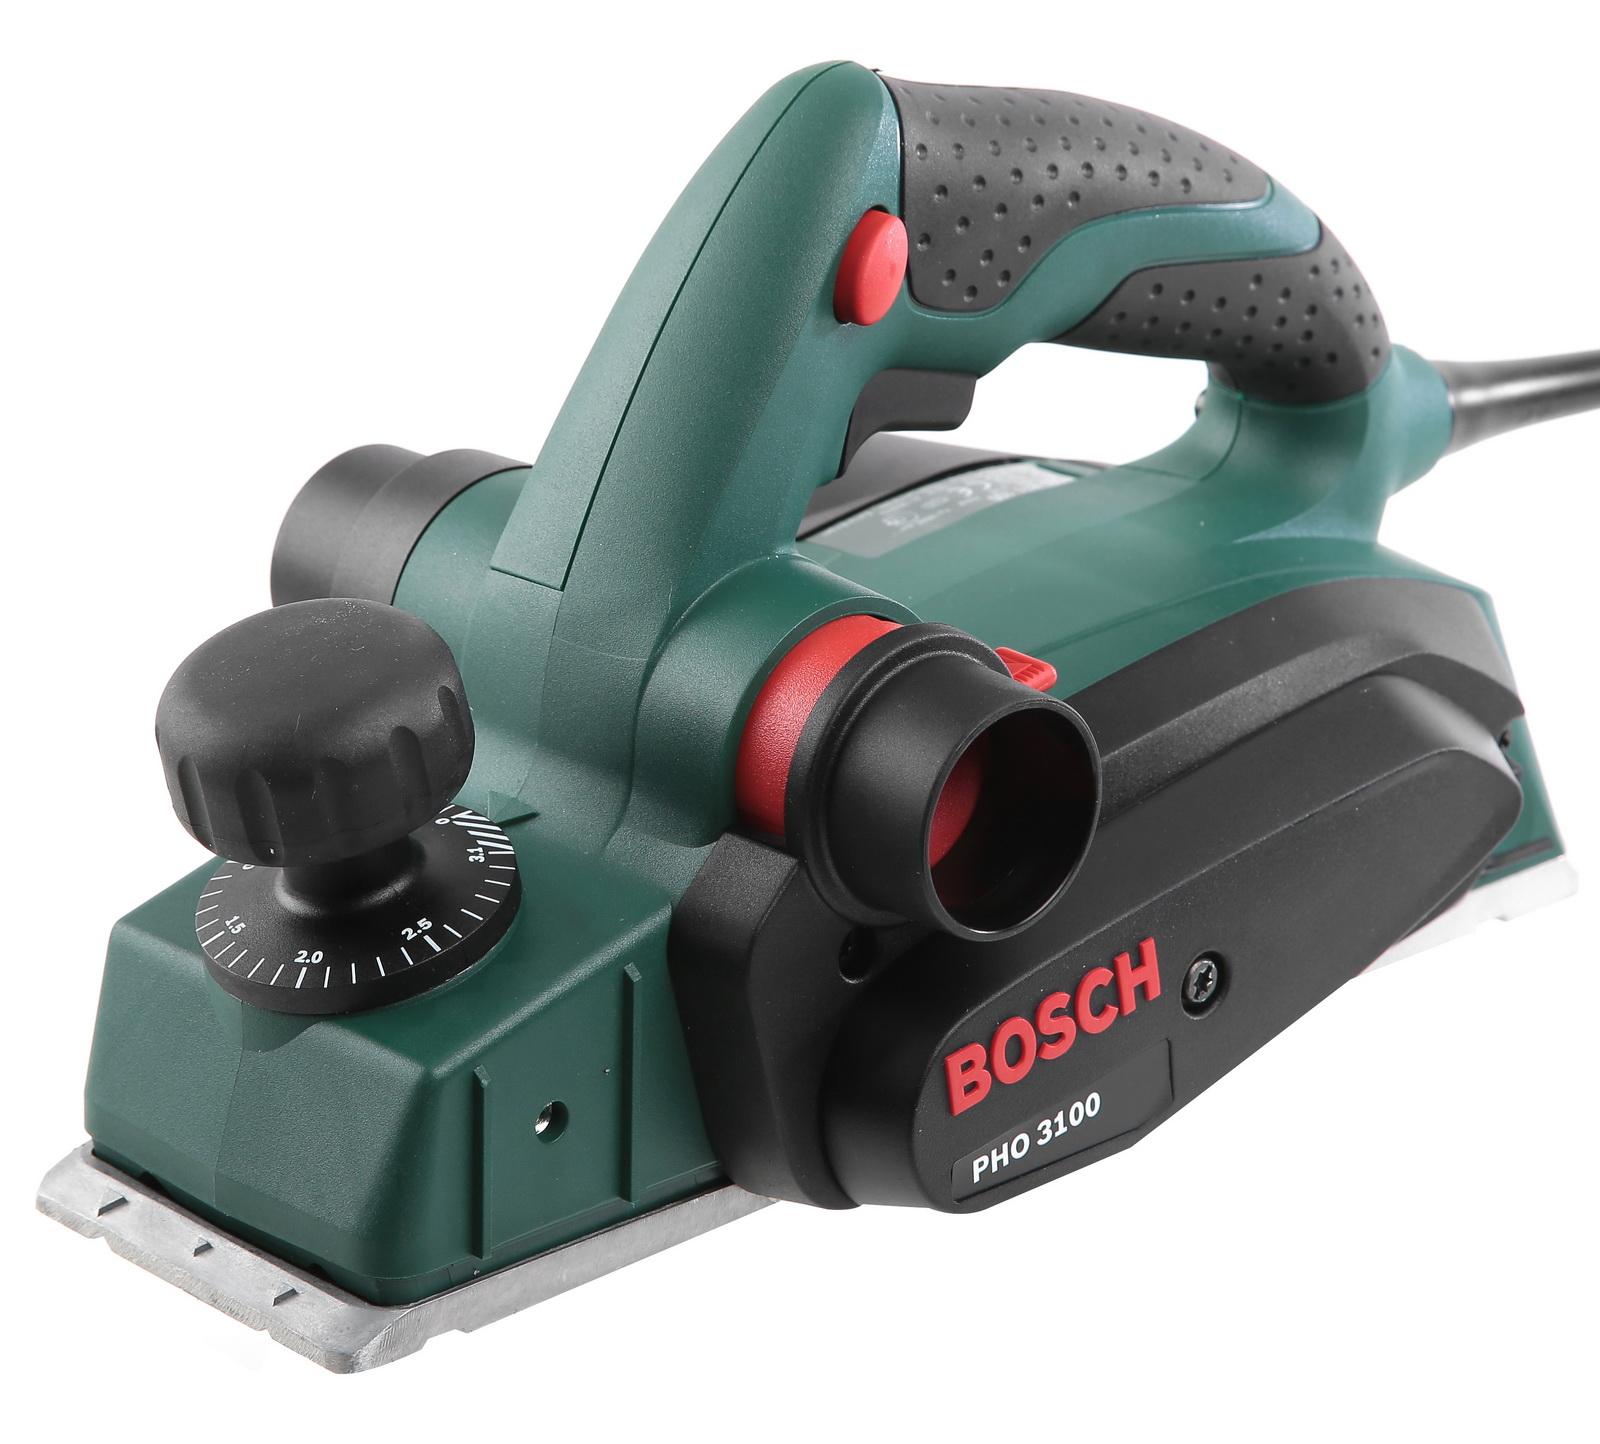 Рубанок Bosch Pho 3100